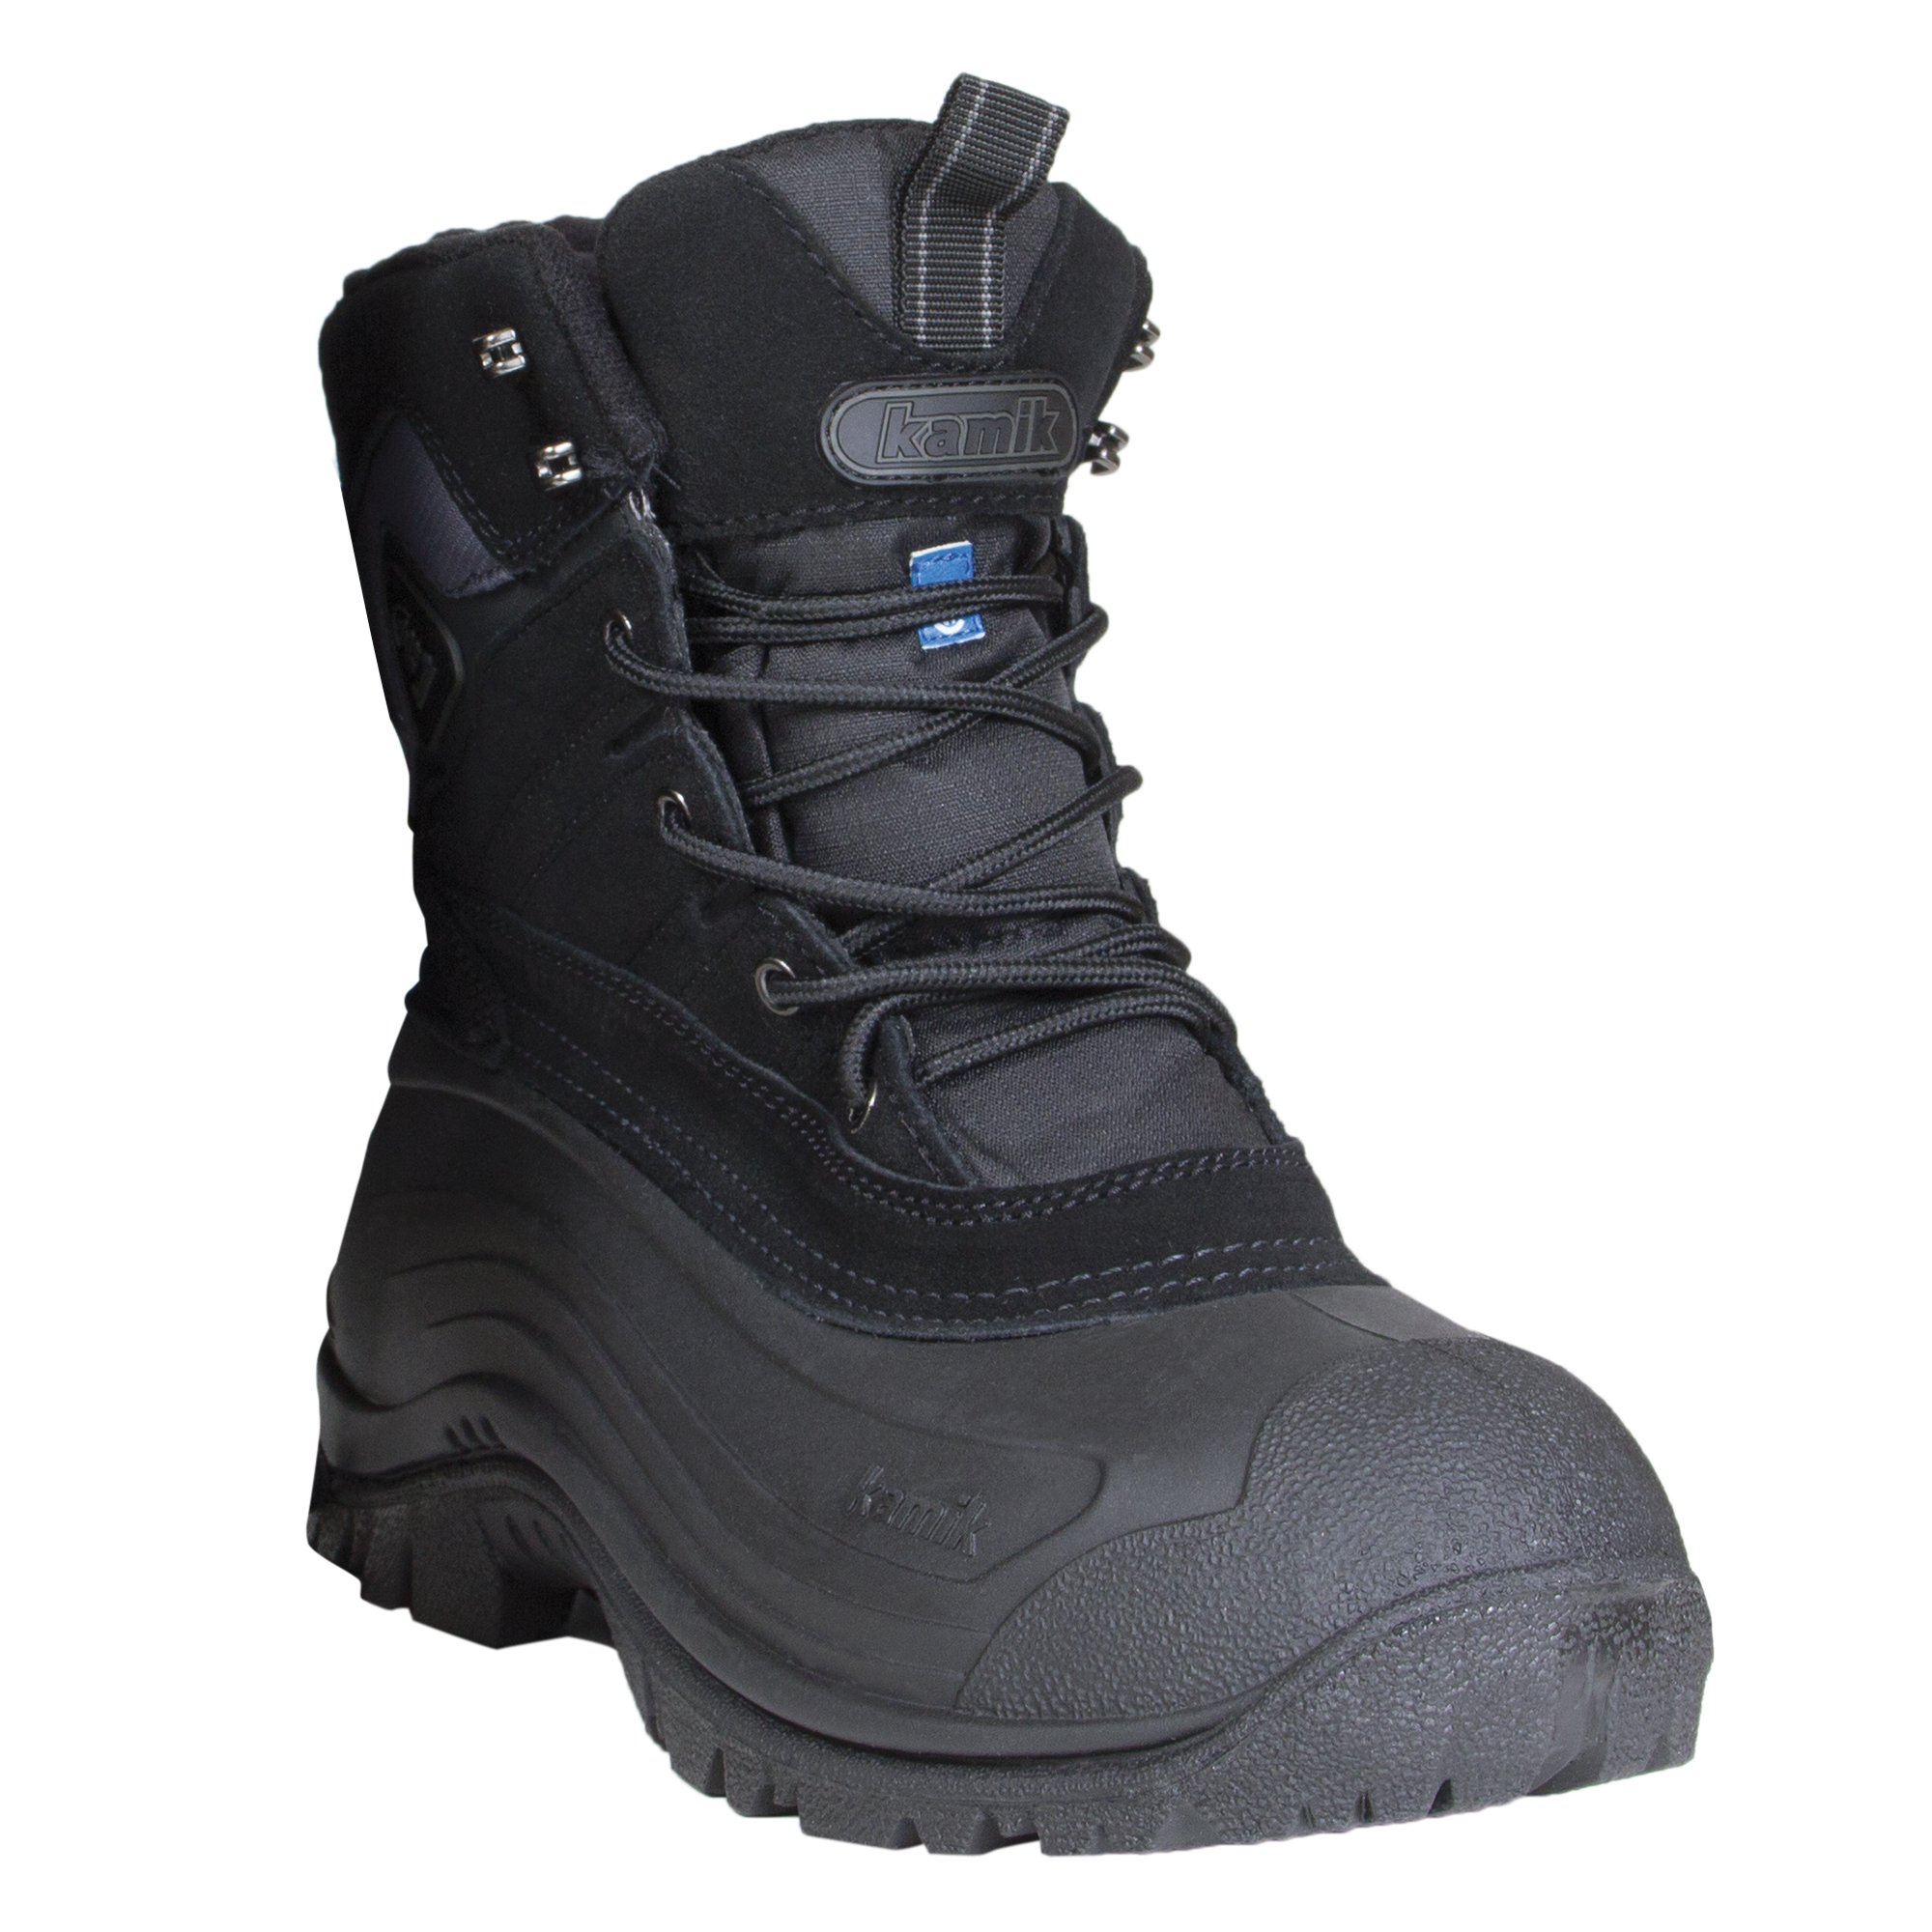 RefrigiWear Men's Pedigree Pac Boot, Black, 11 US by Refrigiwear